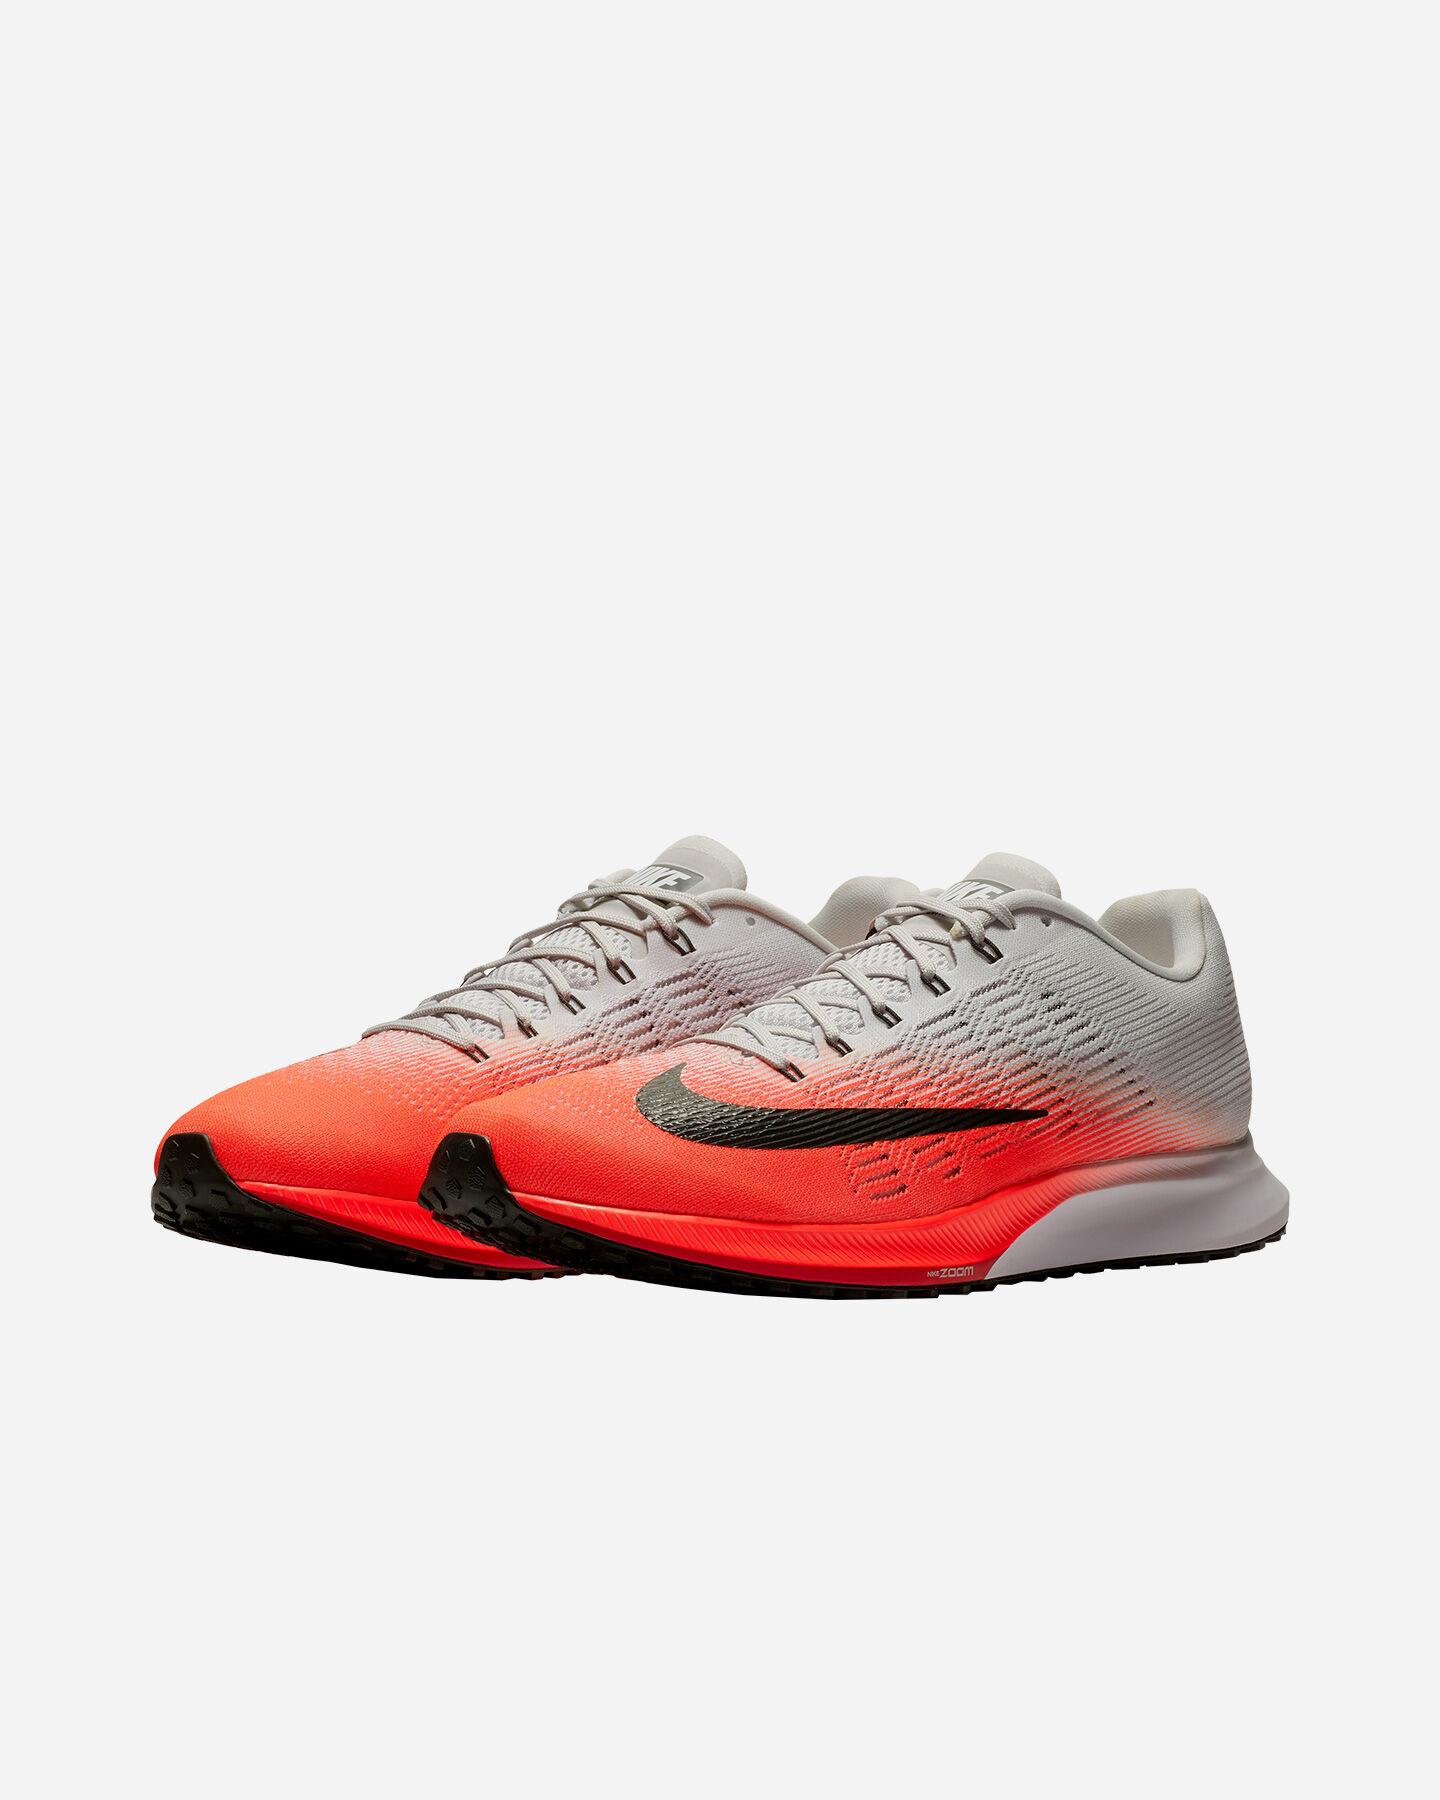 Cisalfa Scarpe 802 Nike Running Sport 863769 9 Gpq6twab Zoom Elite M Su GjqUSpLzMV